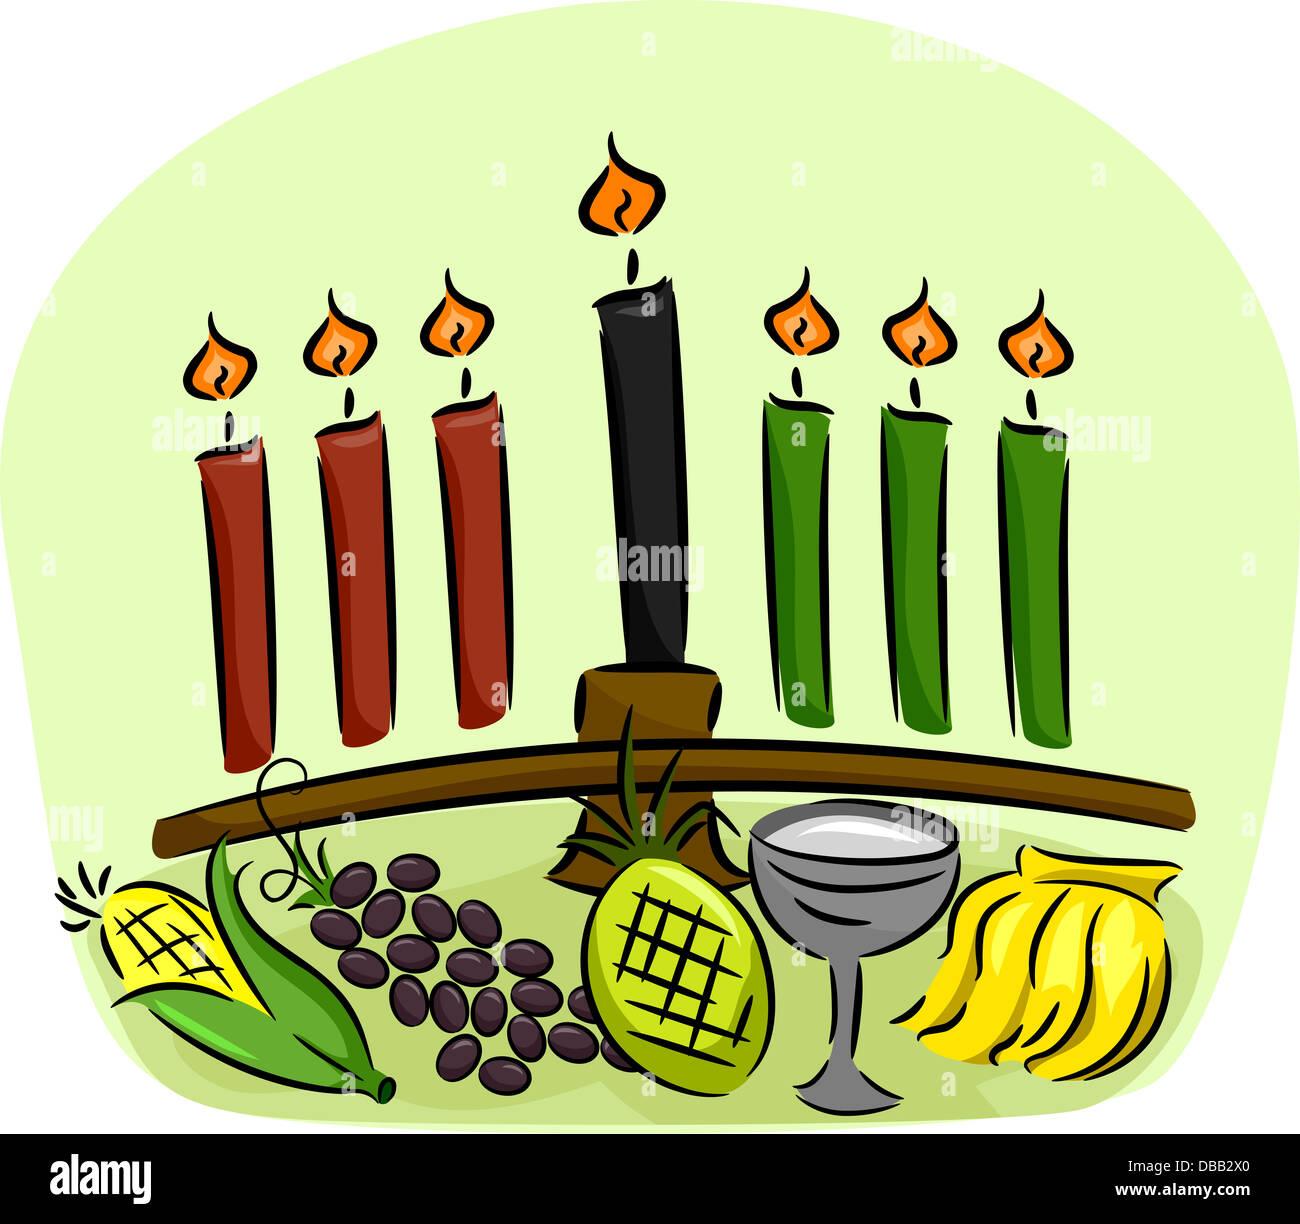 Illustration Of Kwanzaa Symbols Stock Photo 58636088 Alamy